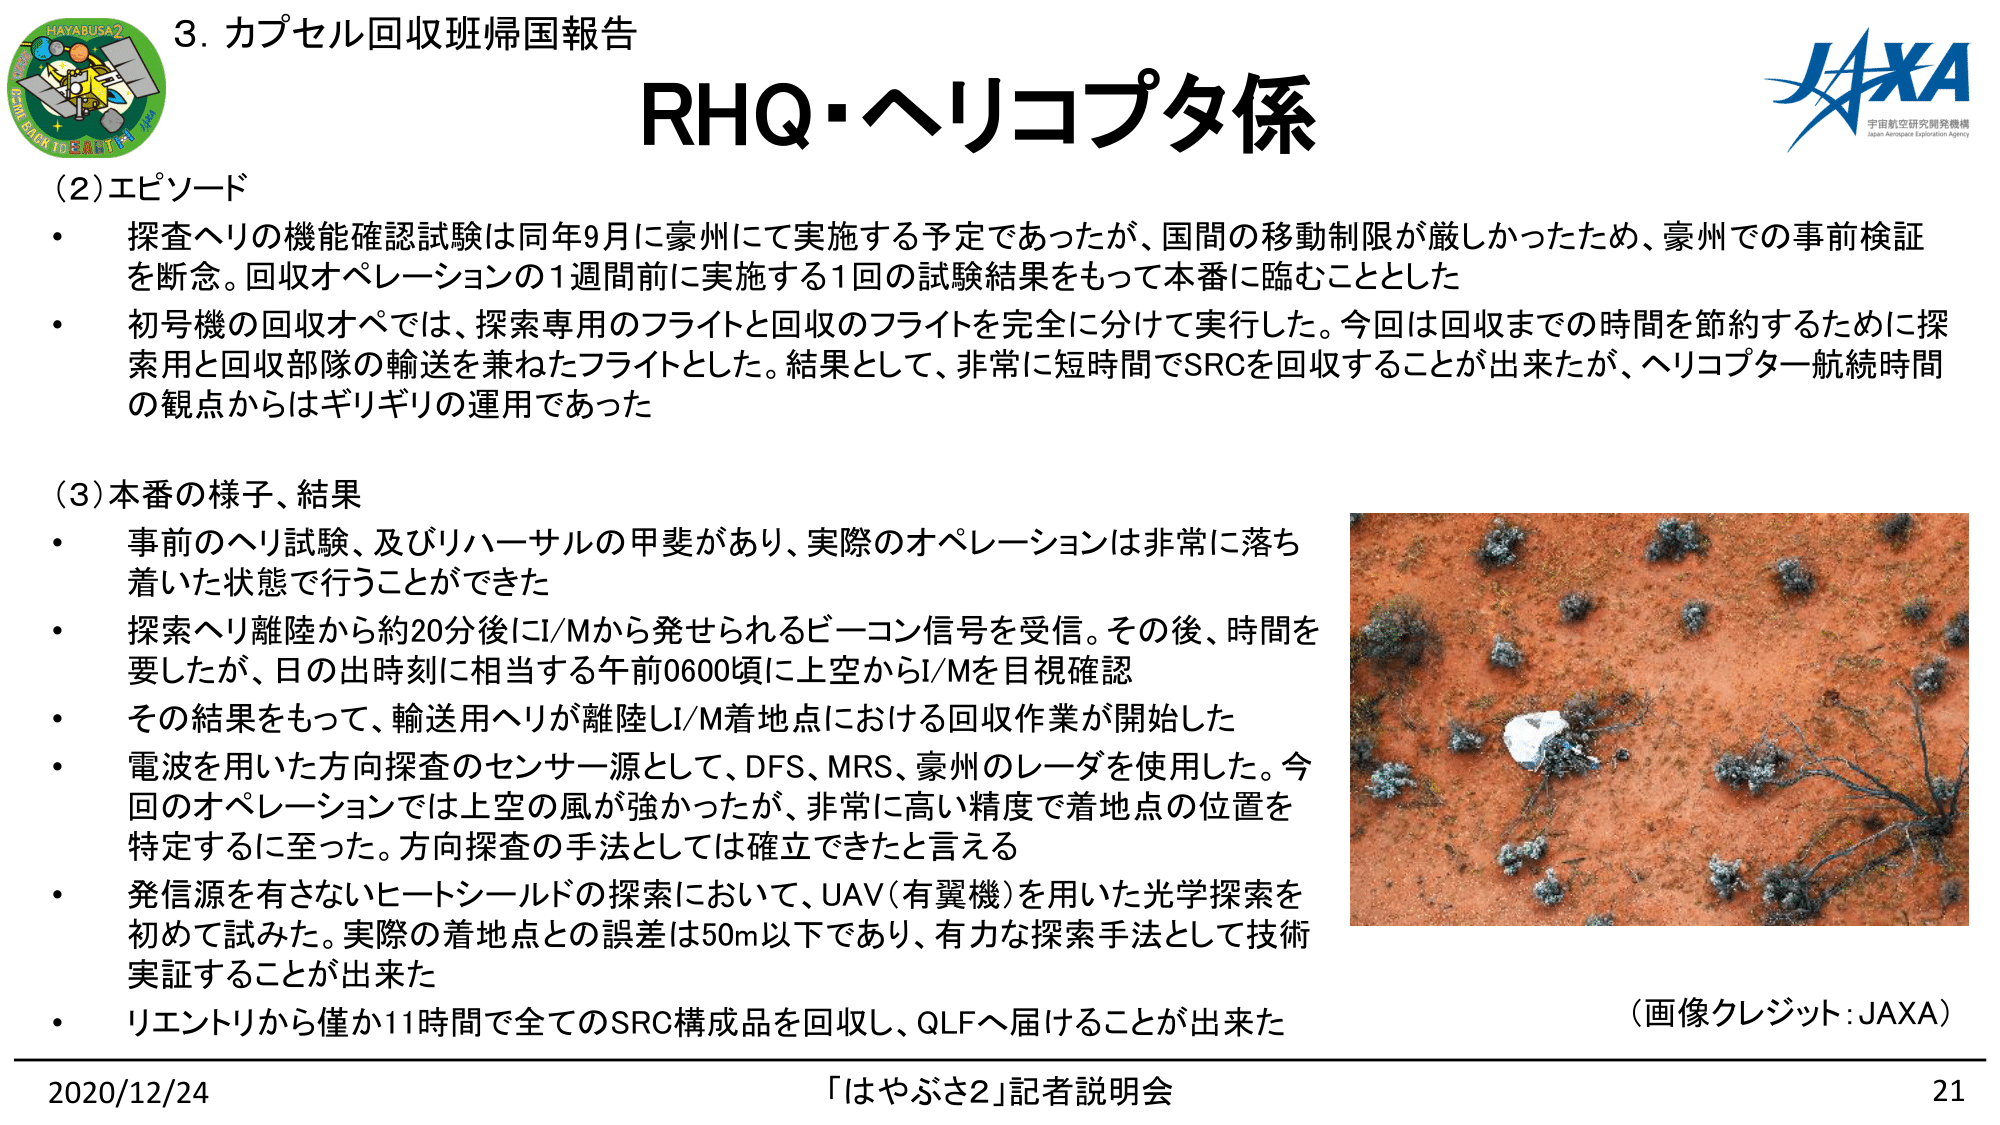 f:id:Imamura:20201224135215p:plain